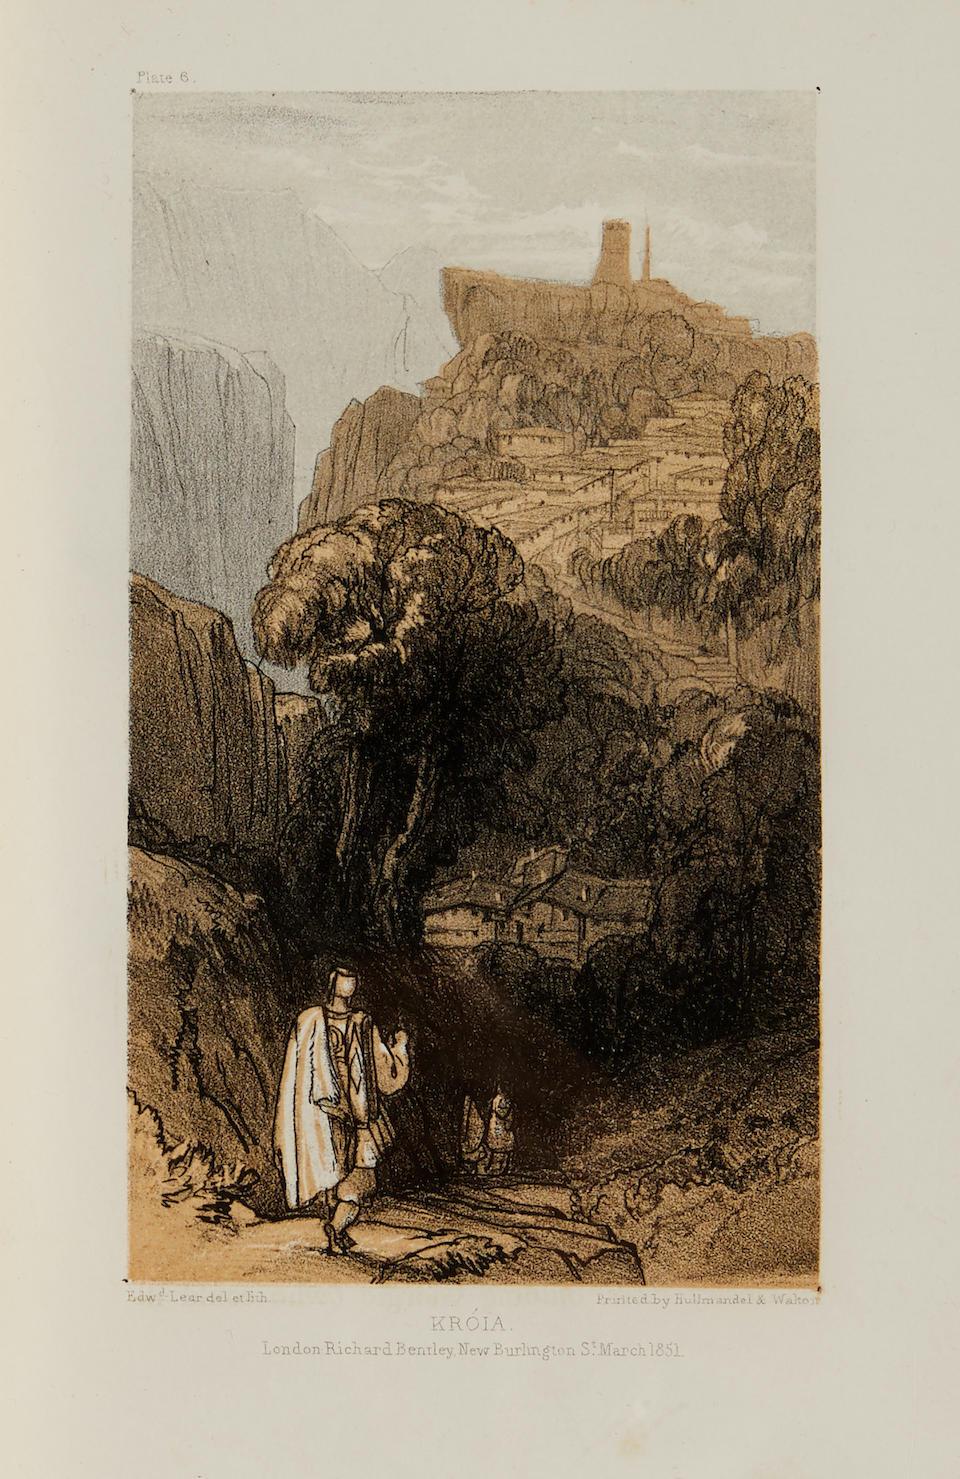 LEAR, EDWARD. 1812-1888. Journals of a Landscape Painter in Albania, &C. London: Richard Bentley, 1851.